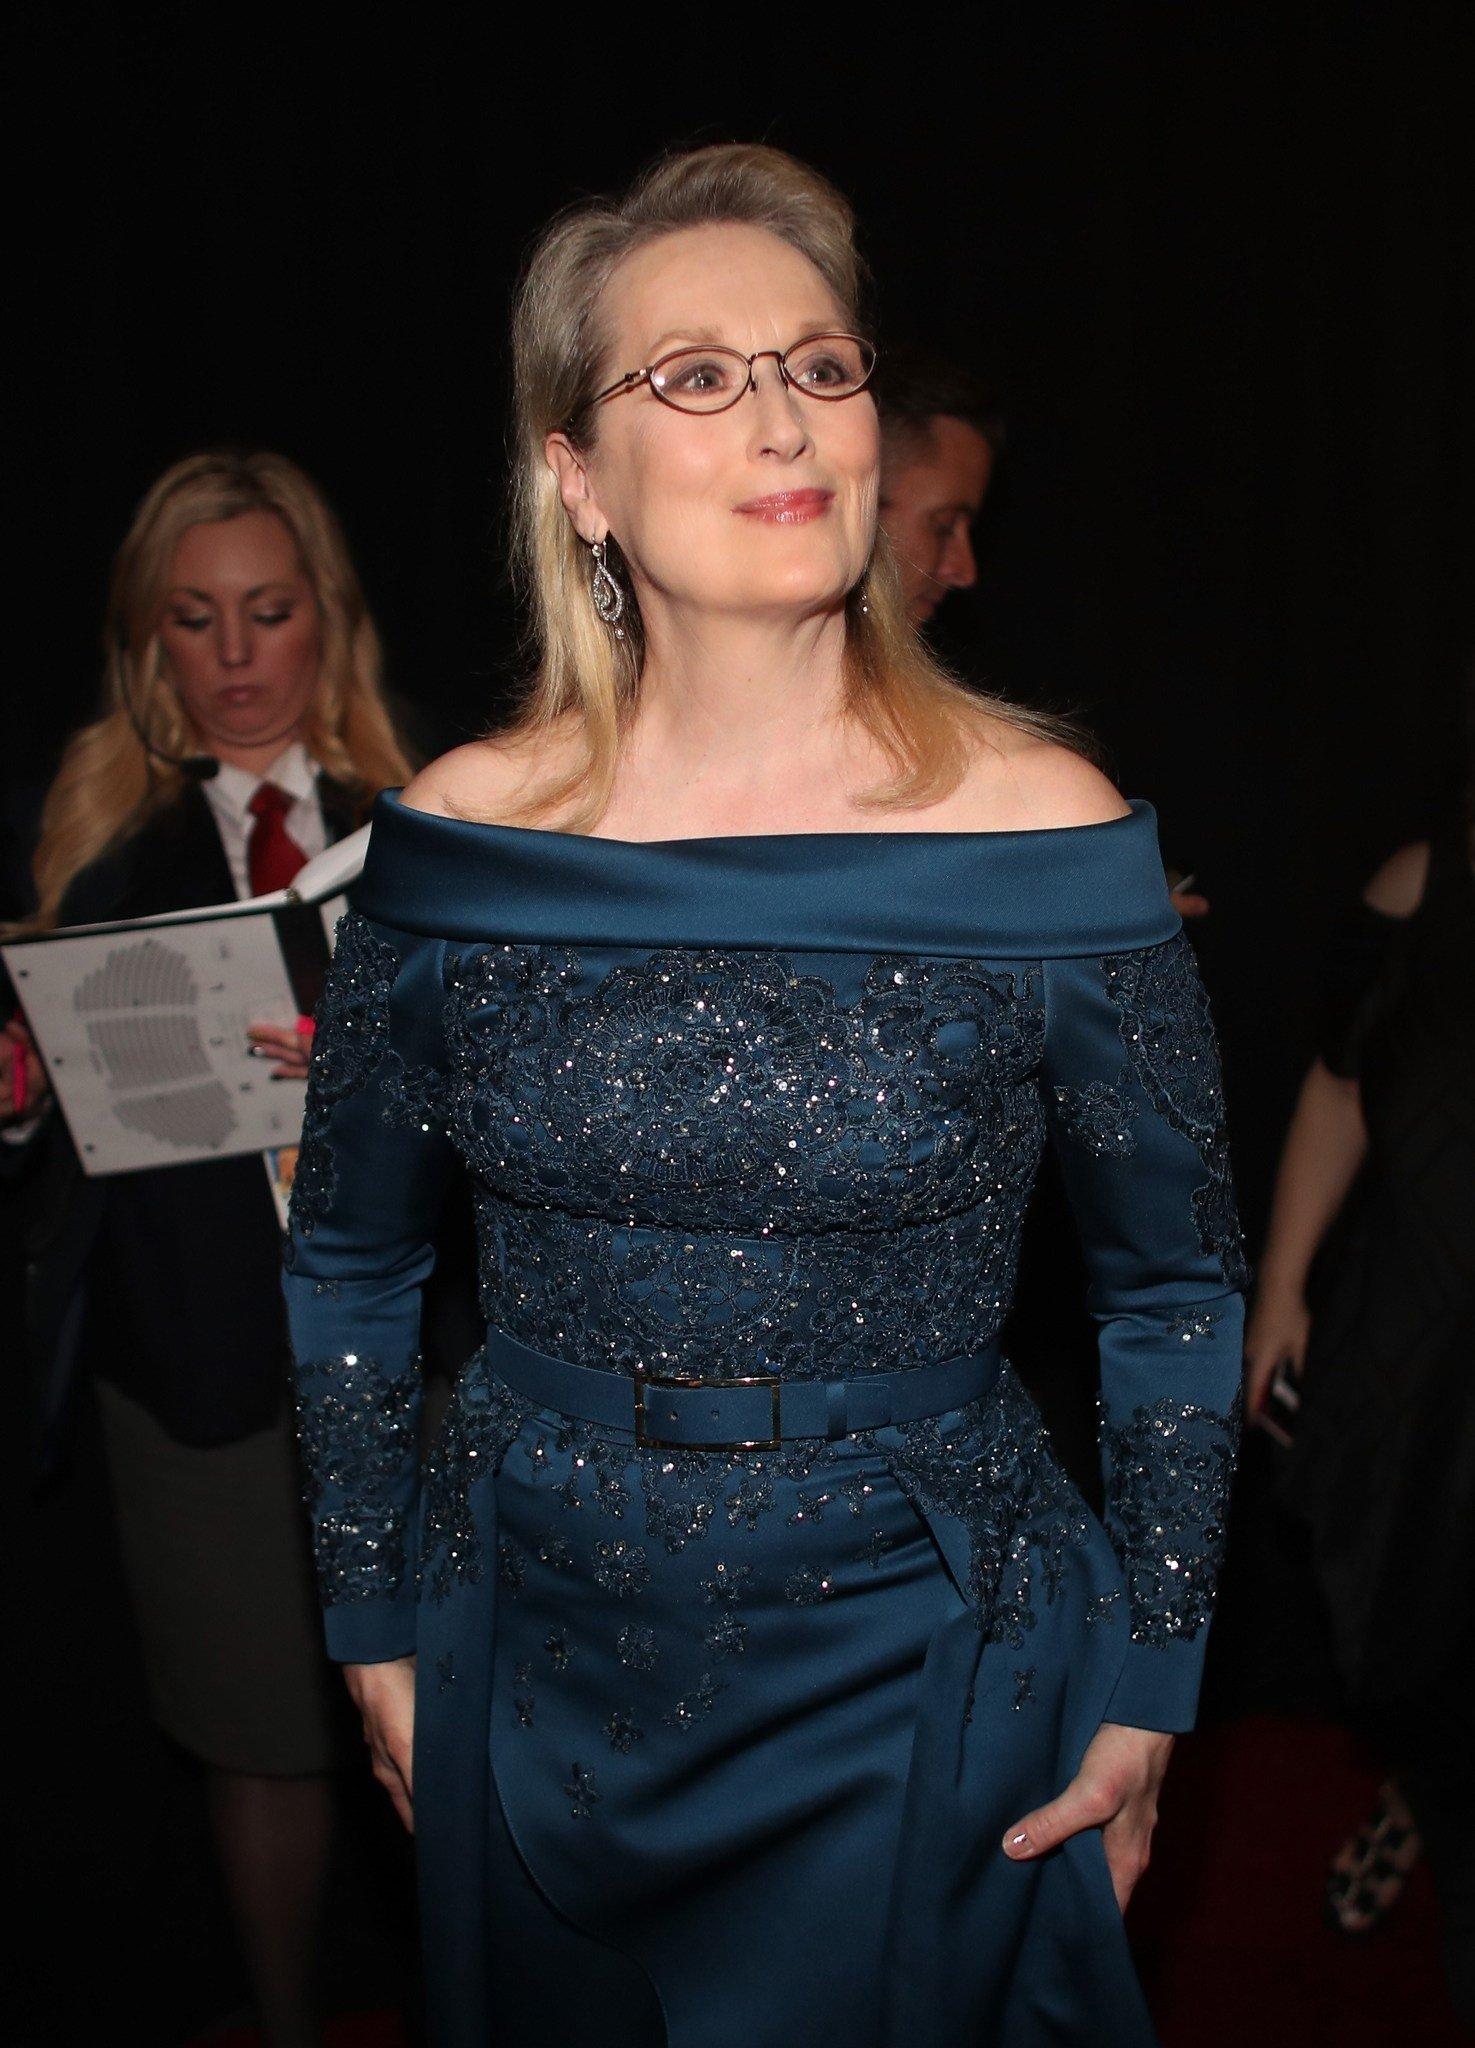 Ünlü modacıdan Meryl Streep'e şok sözler